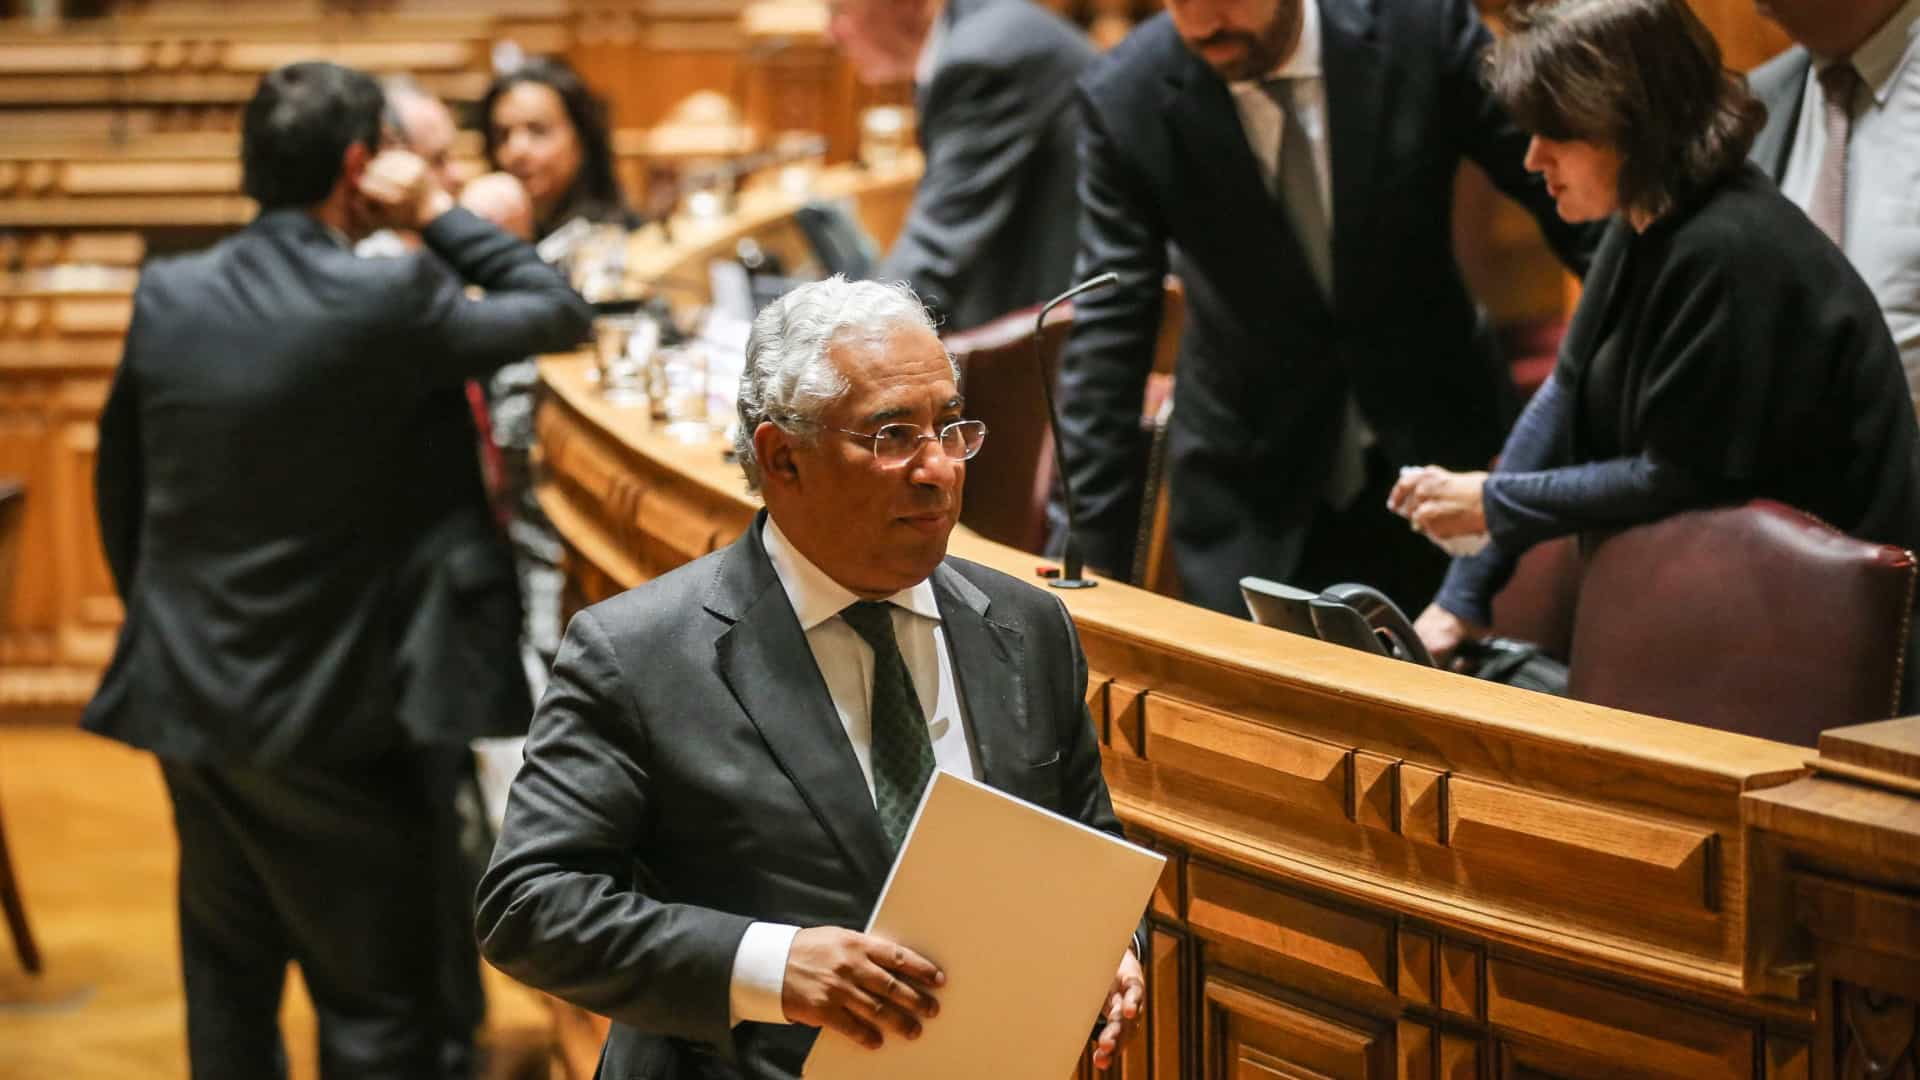 Brexit: Costa considera que acordo salvaguarda direitos dos portugueses